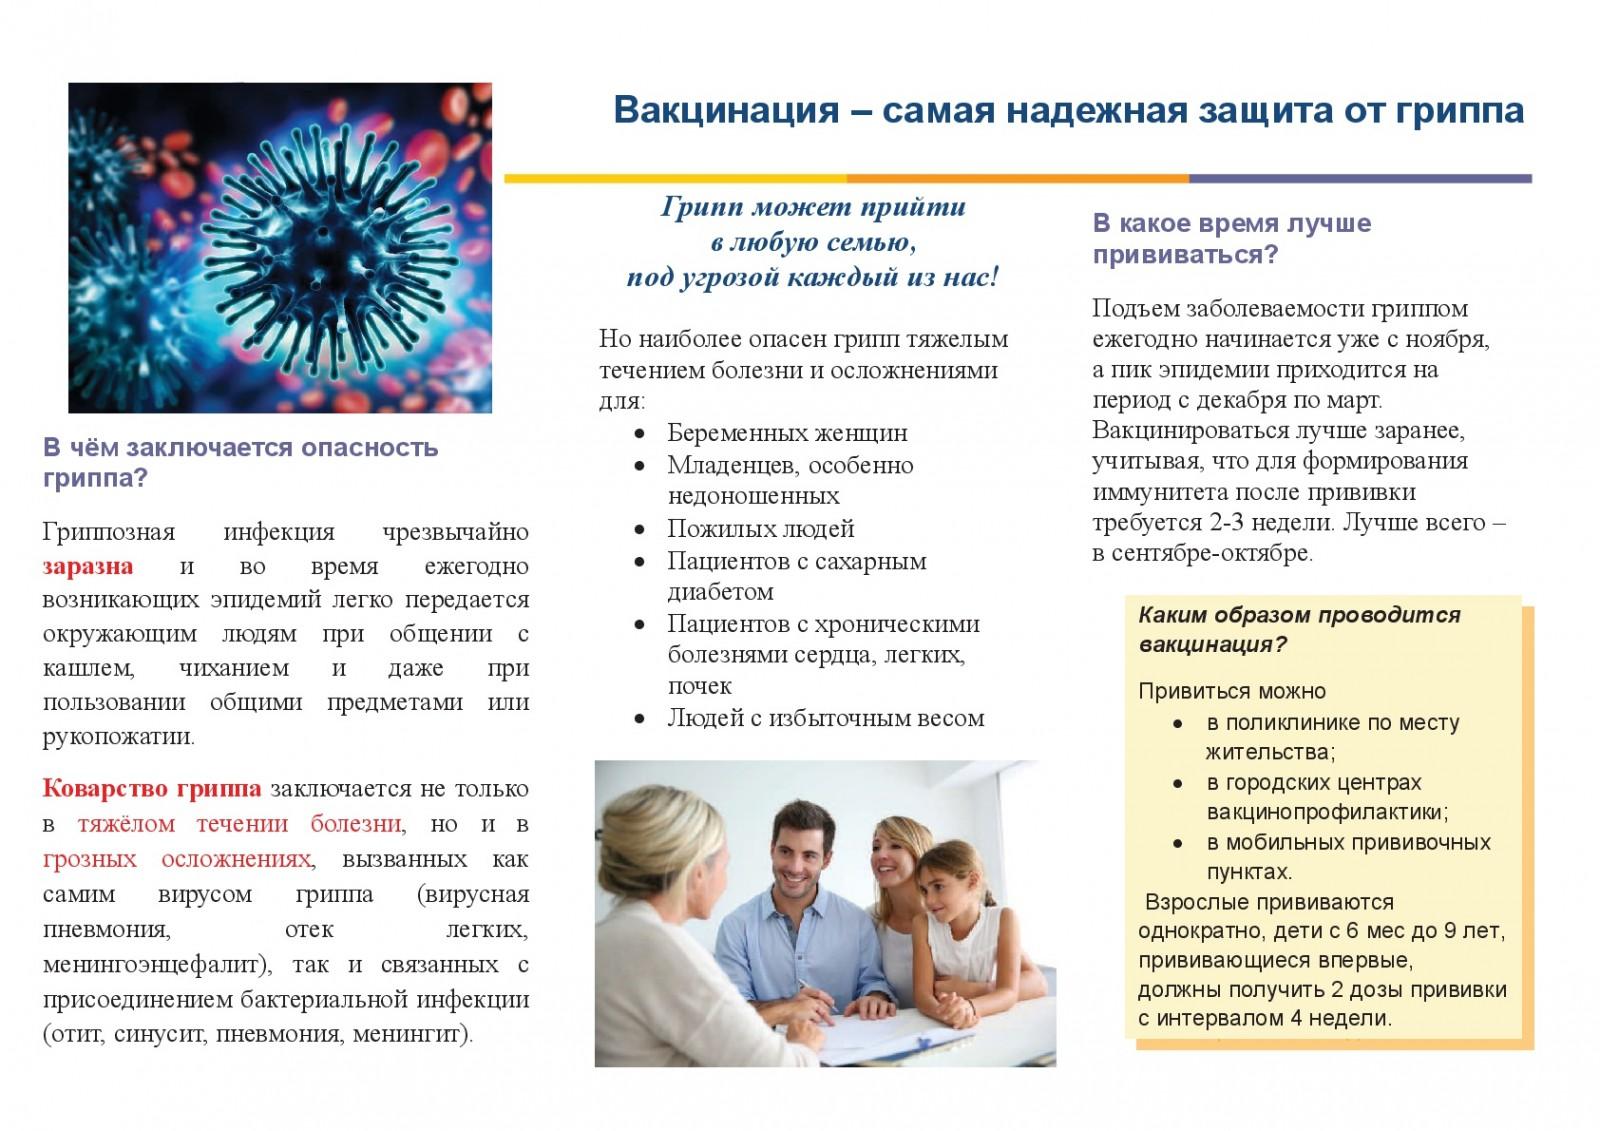 http://etu.ru/assets/images/soc-vosp/health/listovka_2-001.jpg